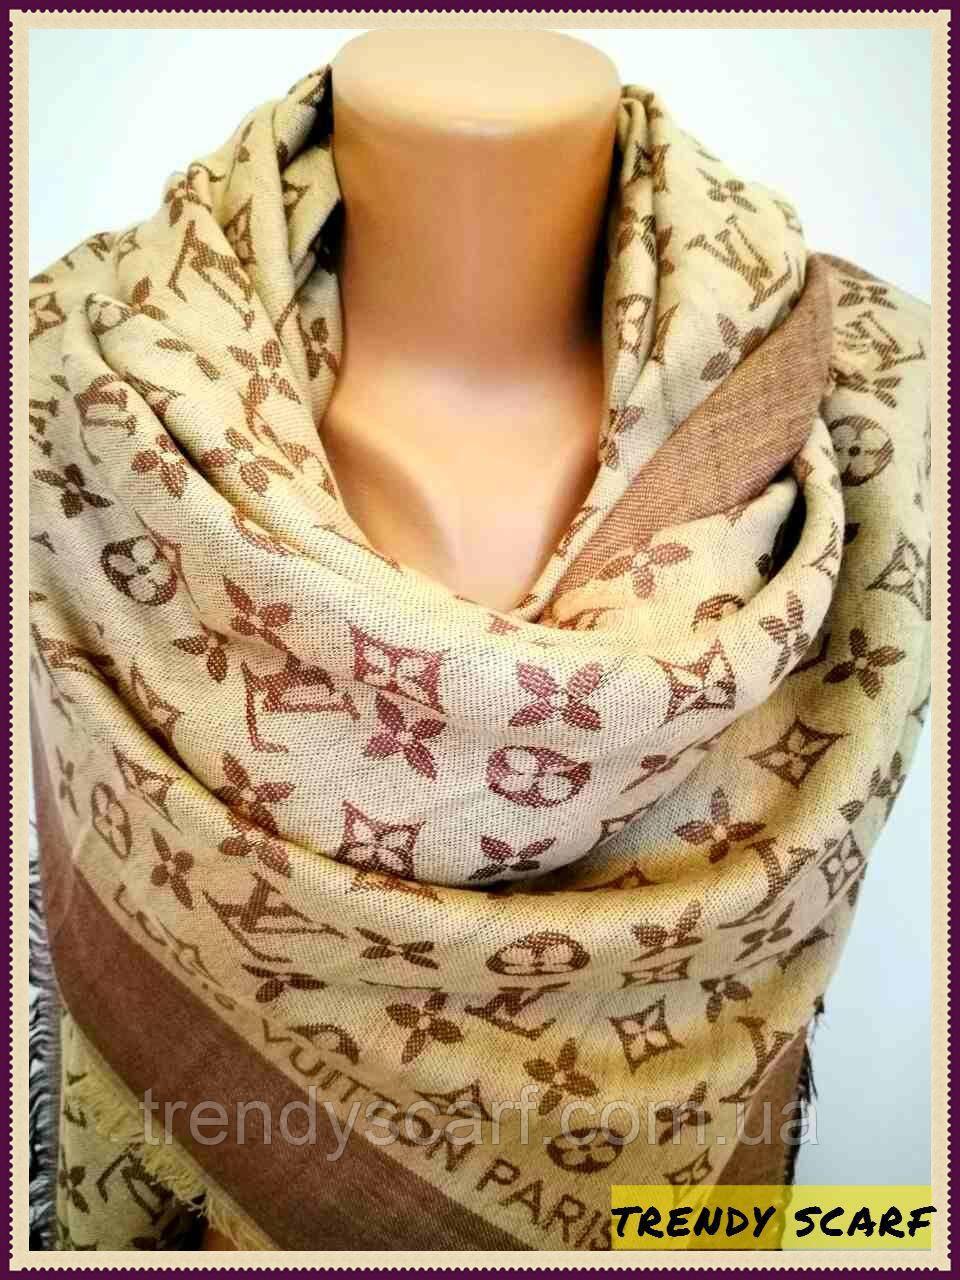 Женский Платок Louis Vuitton Луи Виттон бежевый двухсторонний платок  monogram реплика шерсть шелк 140 150 6e05025eb56